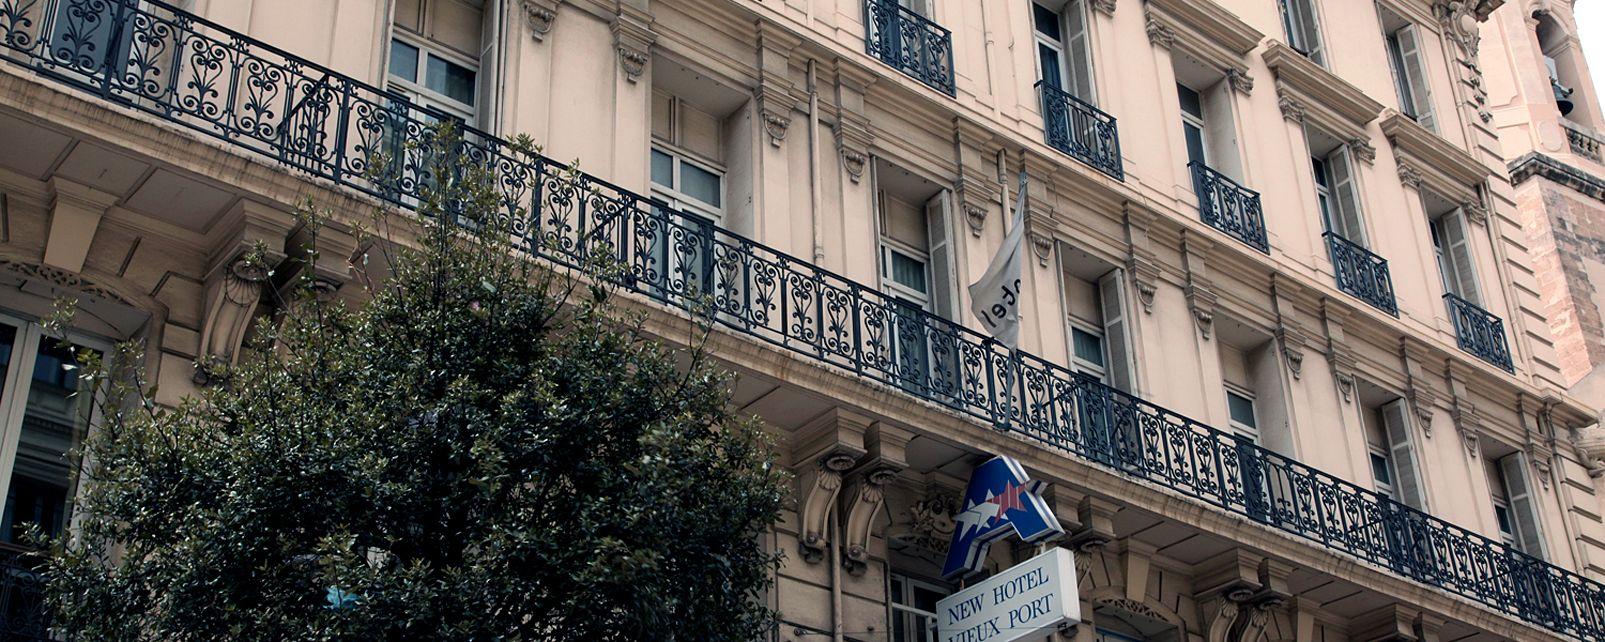 Hôtel New Vieux Port